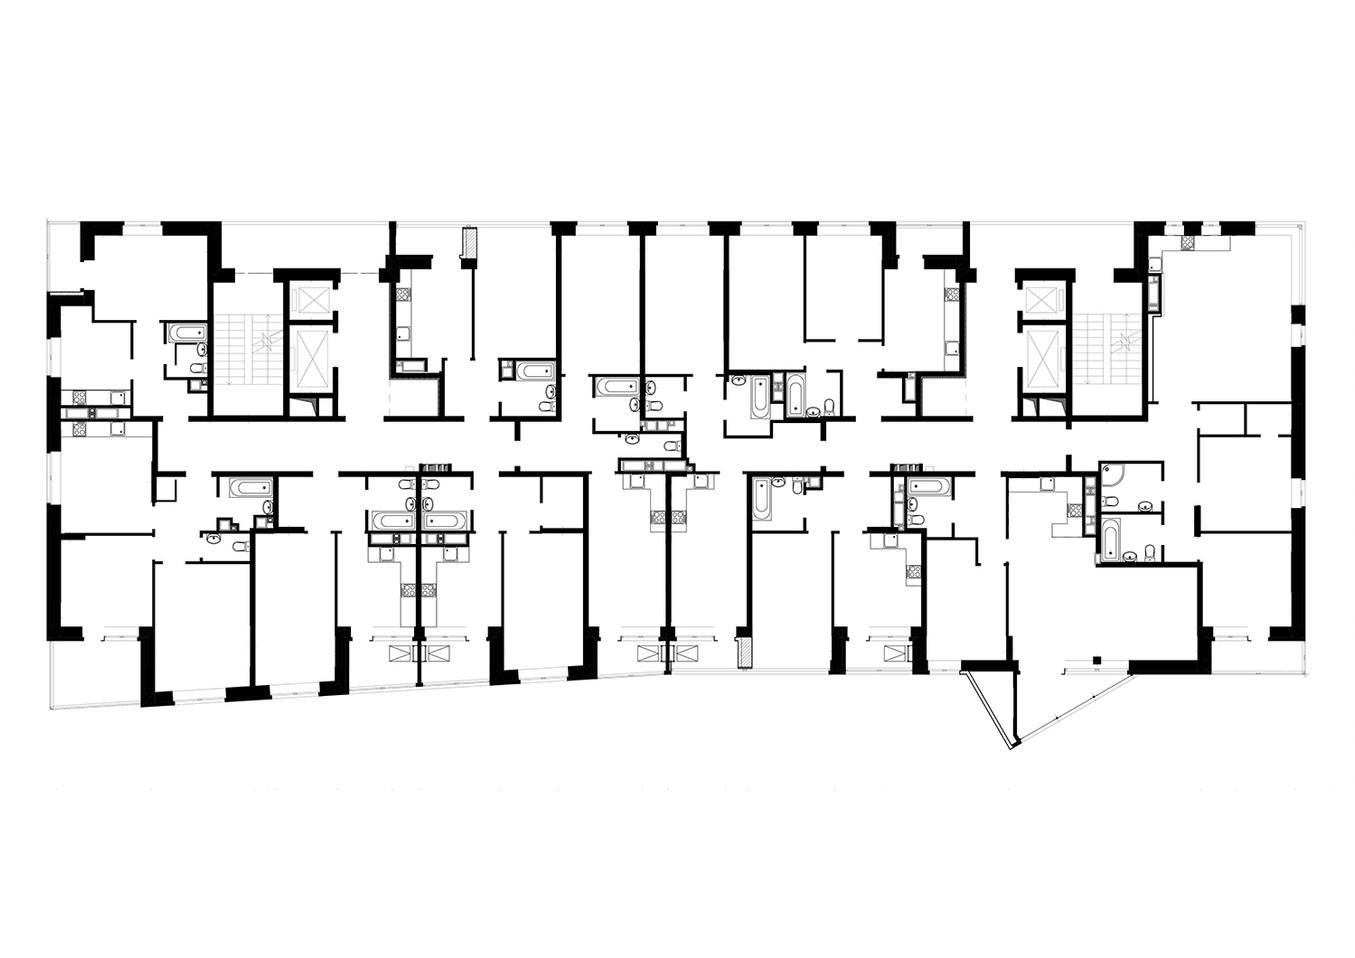 5_план этажа (в прокрутке) min.jpg